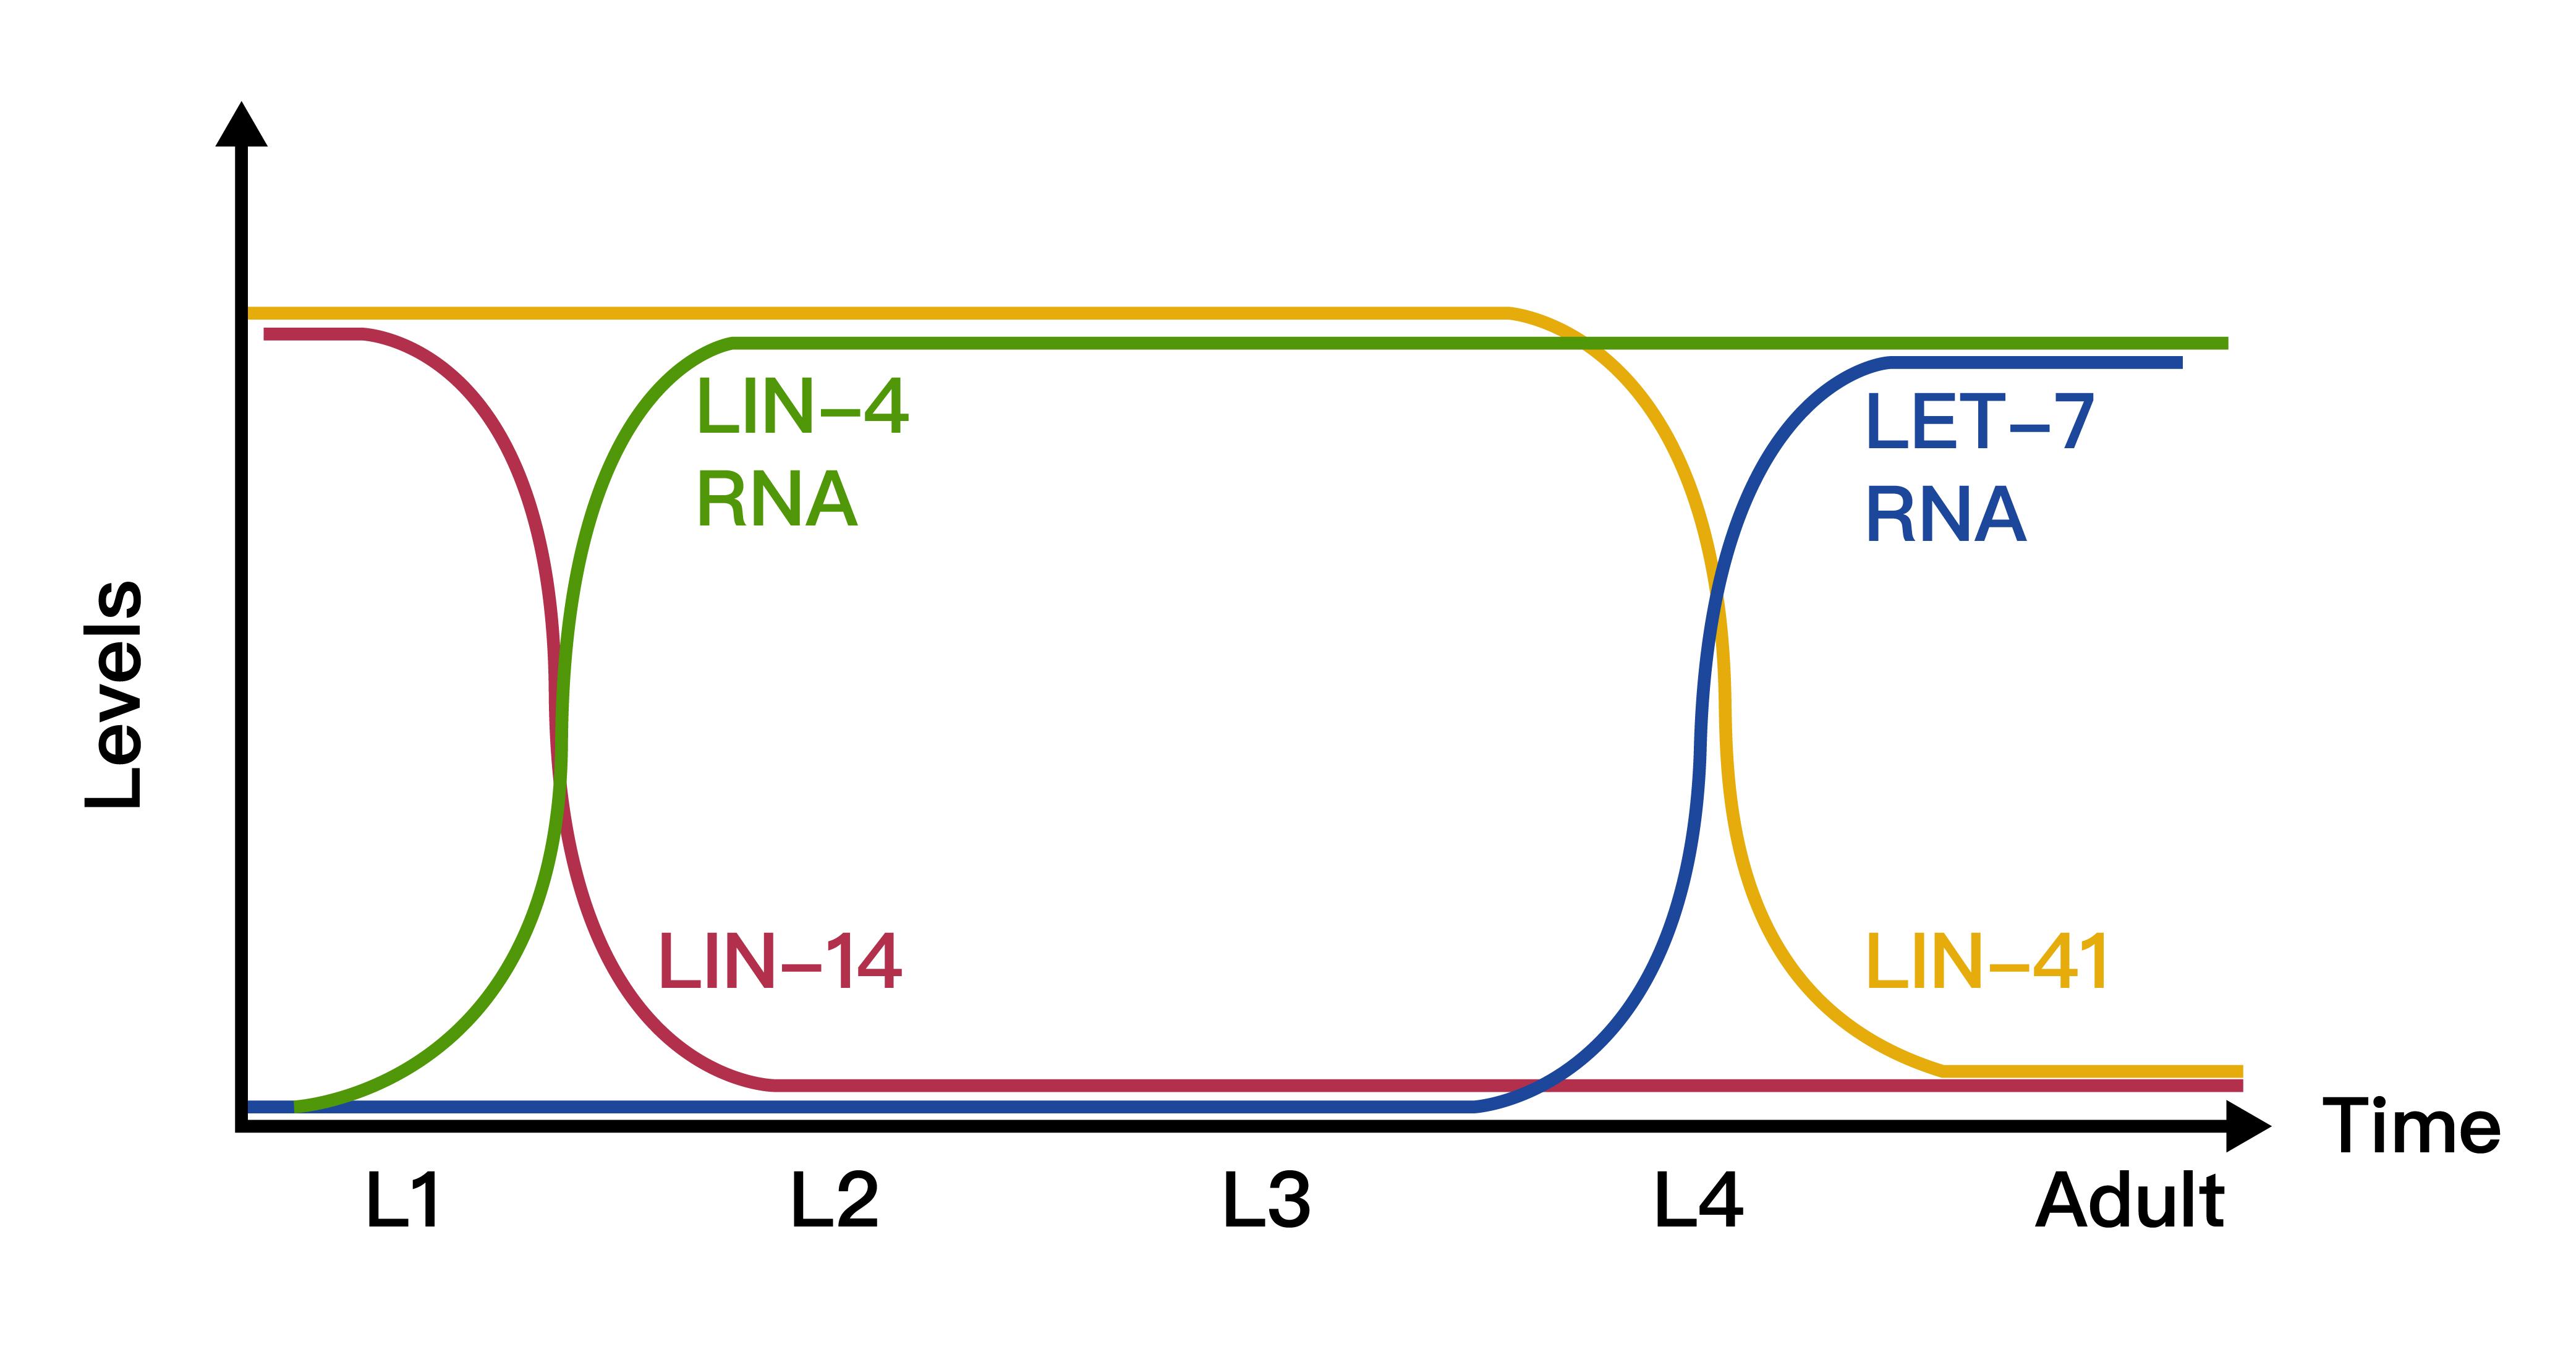 miRNAs lin-4 和 let-7 調控標靶基因的時間關係,貫穿線蟲的年幼時期到成蟲。圖│Vella, M.C., & Slack, F.J. (2005). C. elegans microRNAs. WormBook : the online review of C. elegans biology, 1-9.